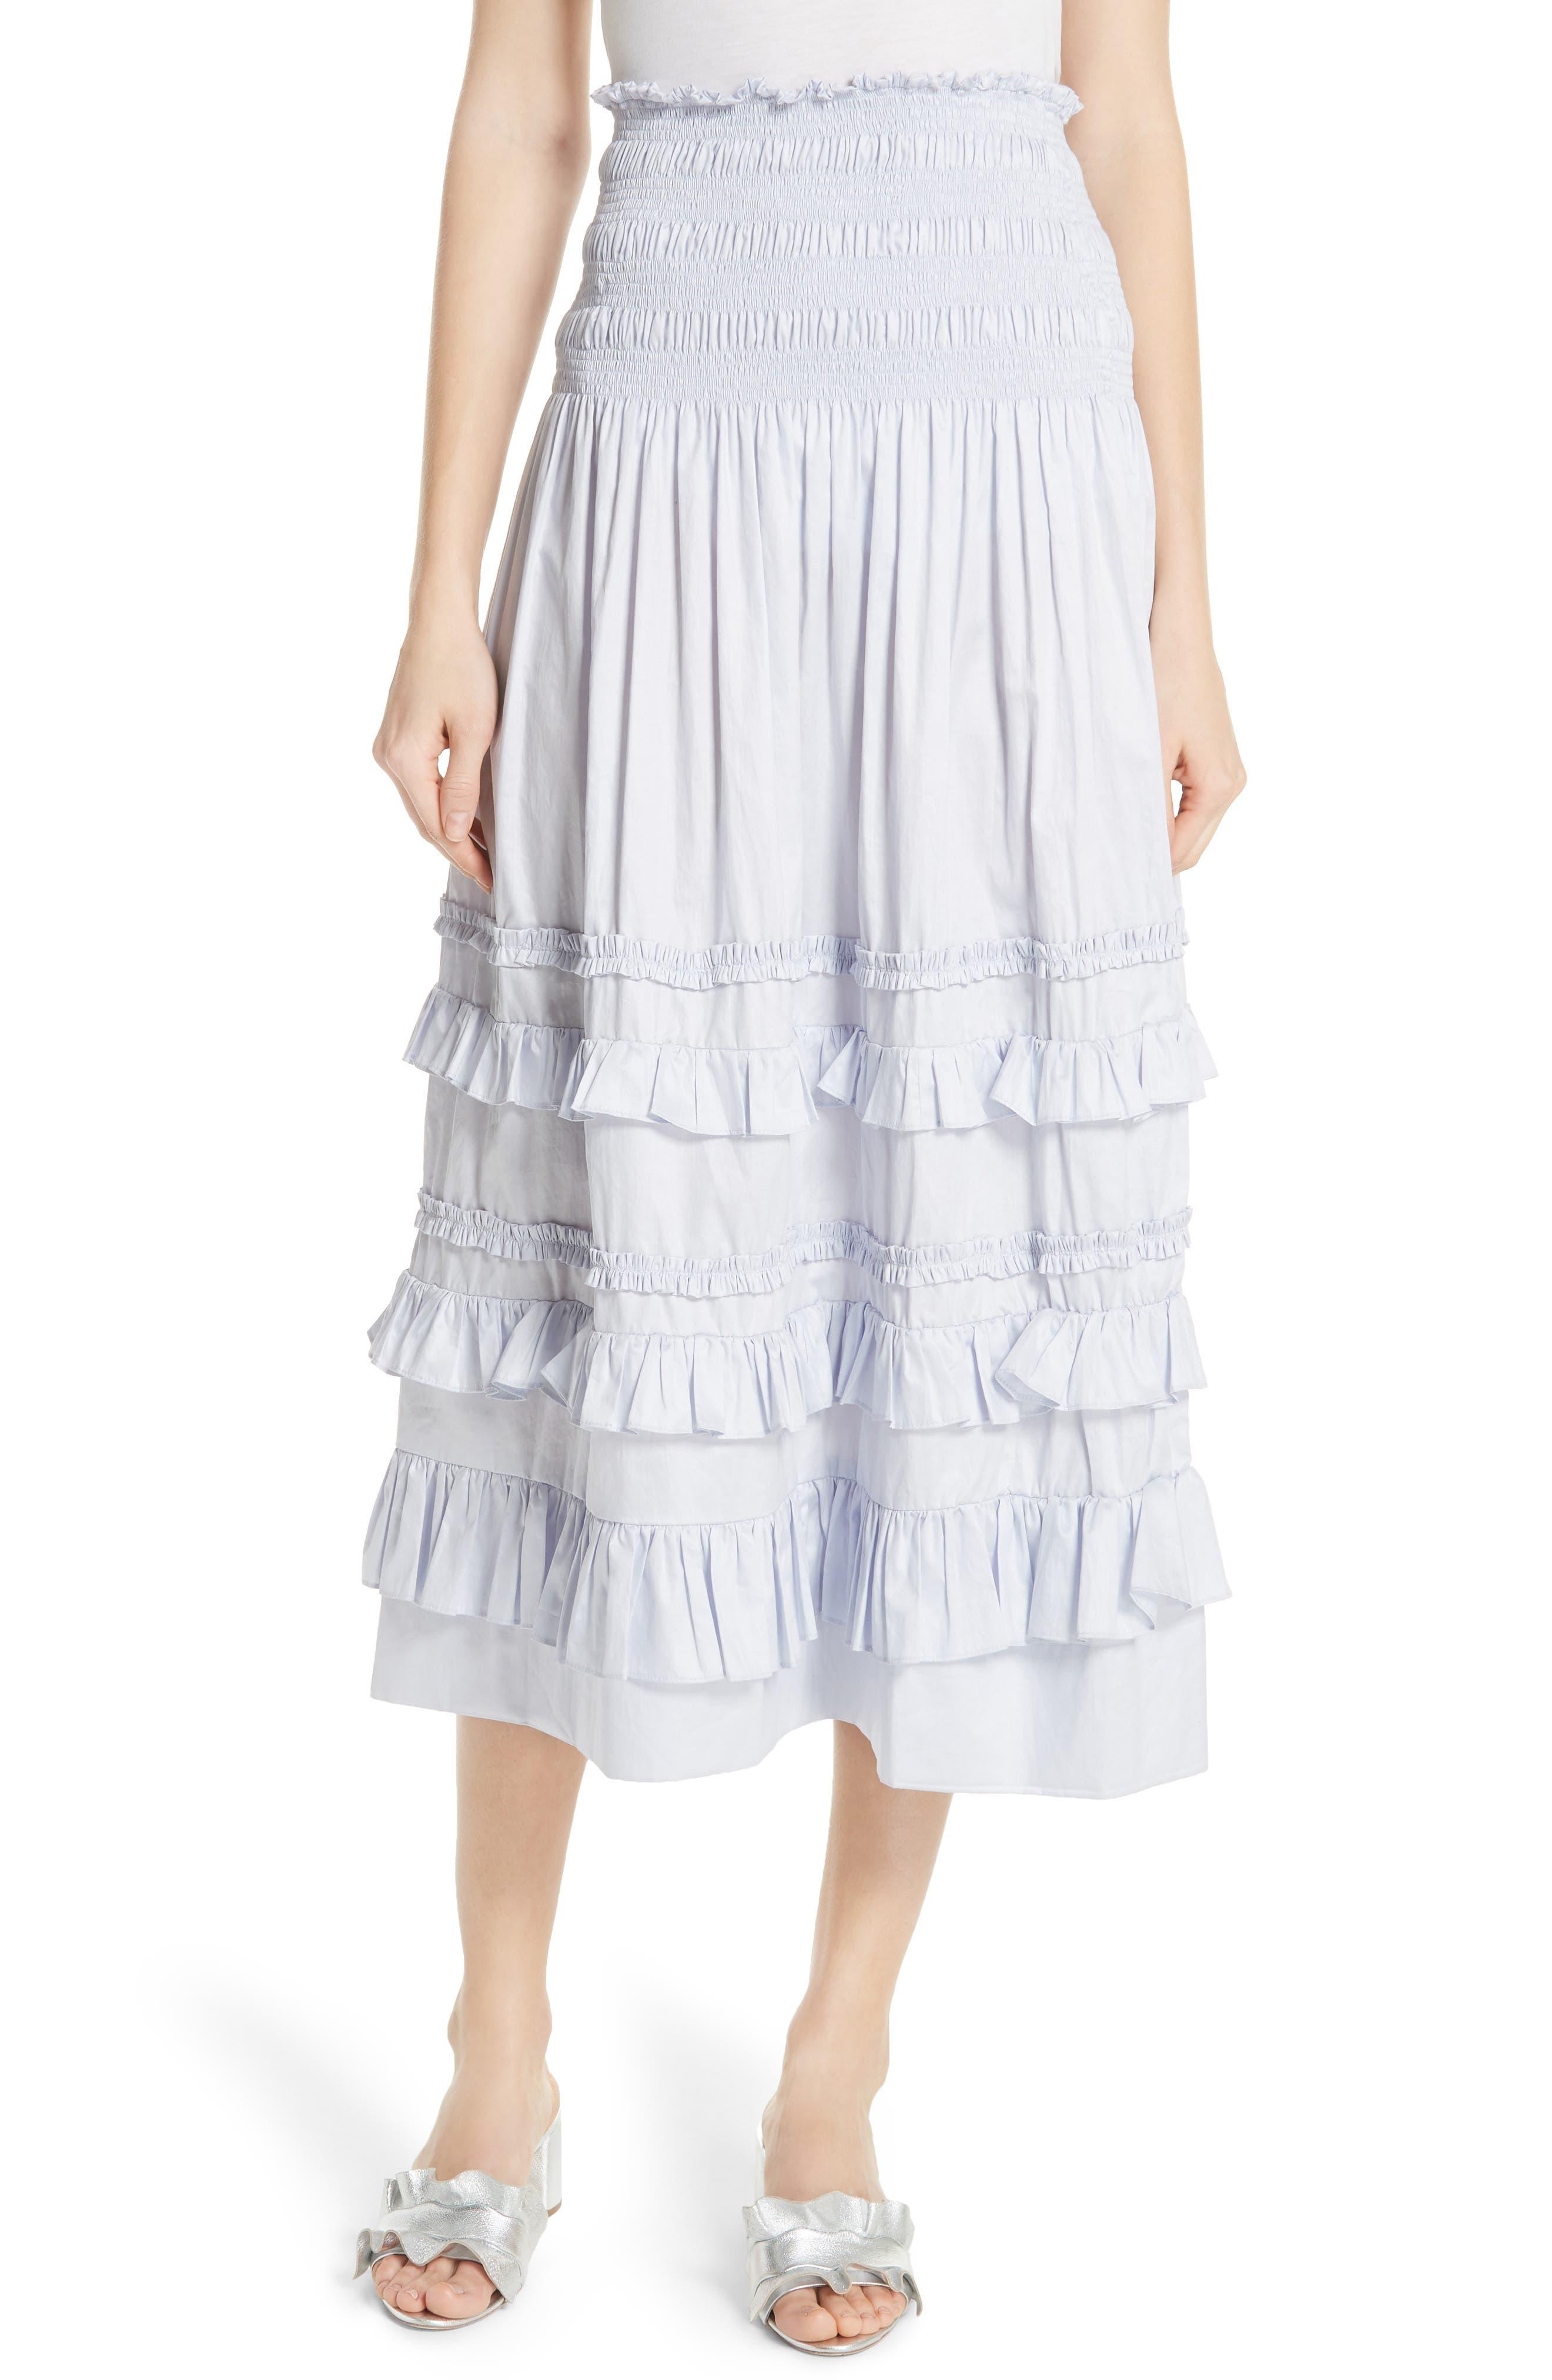 REBECCA TAYLOR, Ruffle Trim Midi Skirt, Main thumbnail 1, color, 458